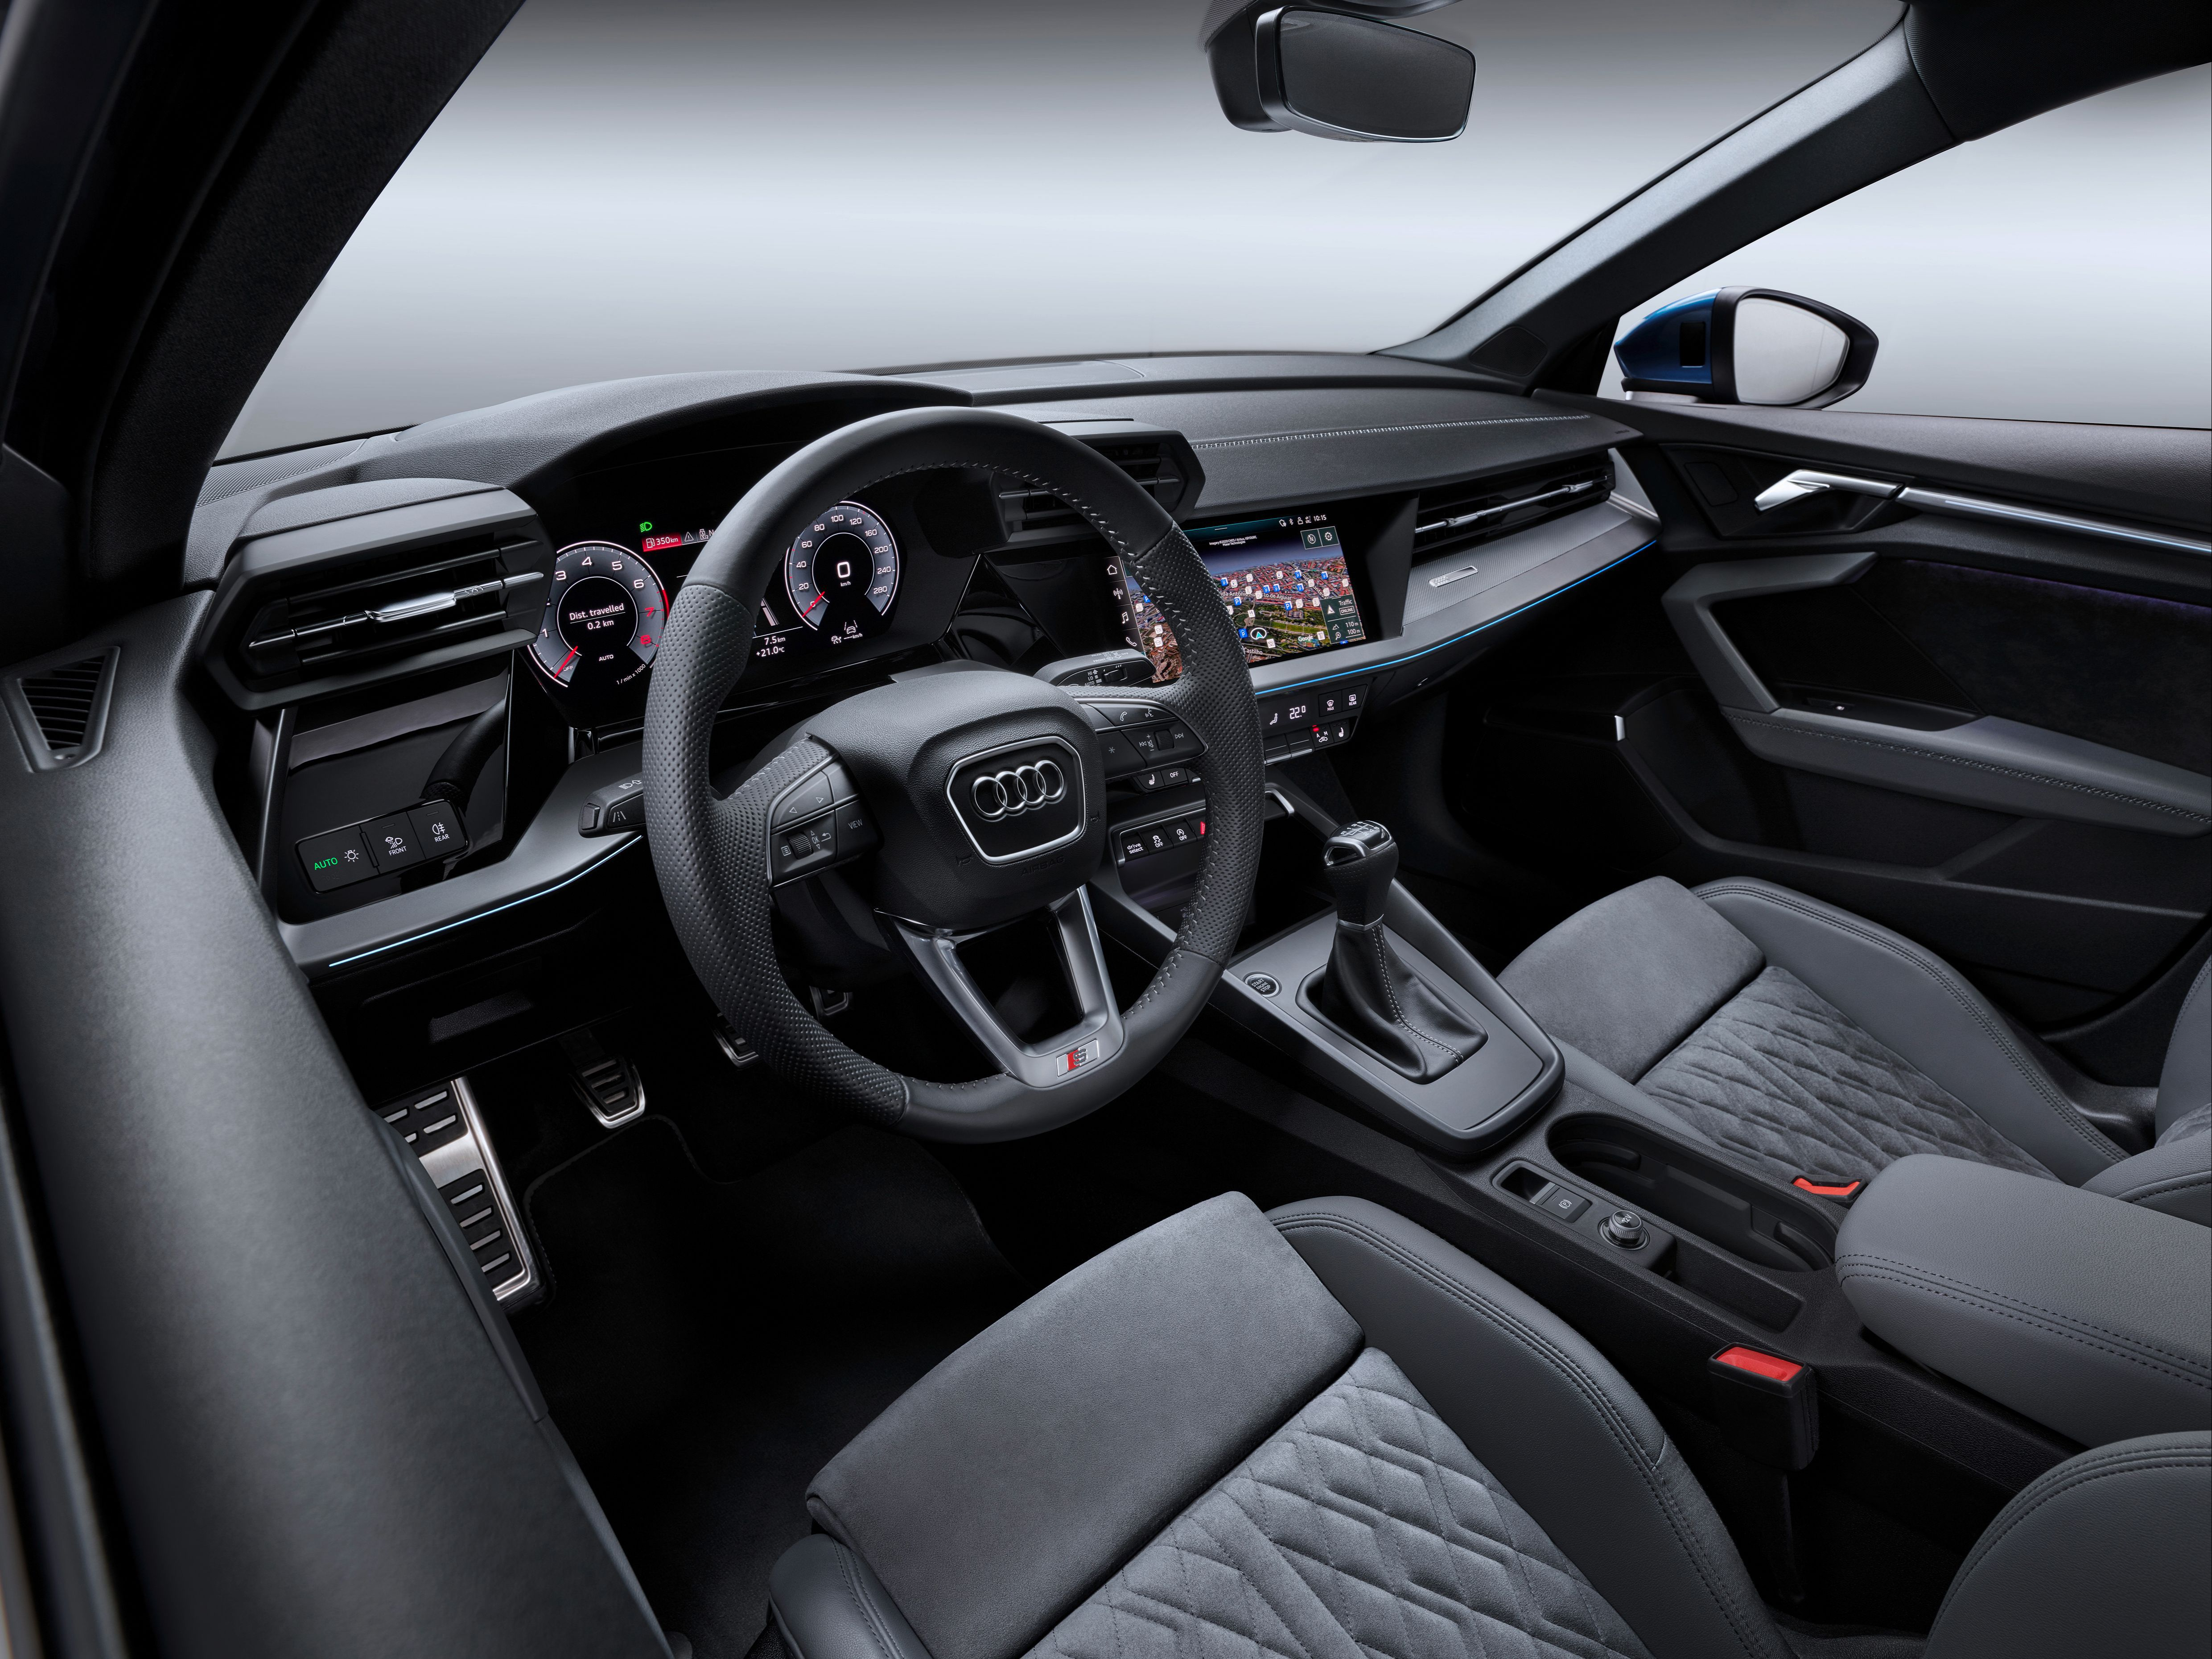 Interior of Audi A3 Sportback